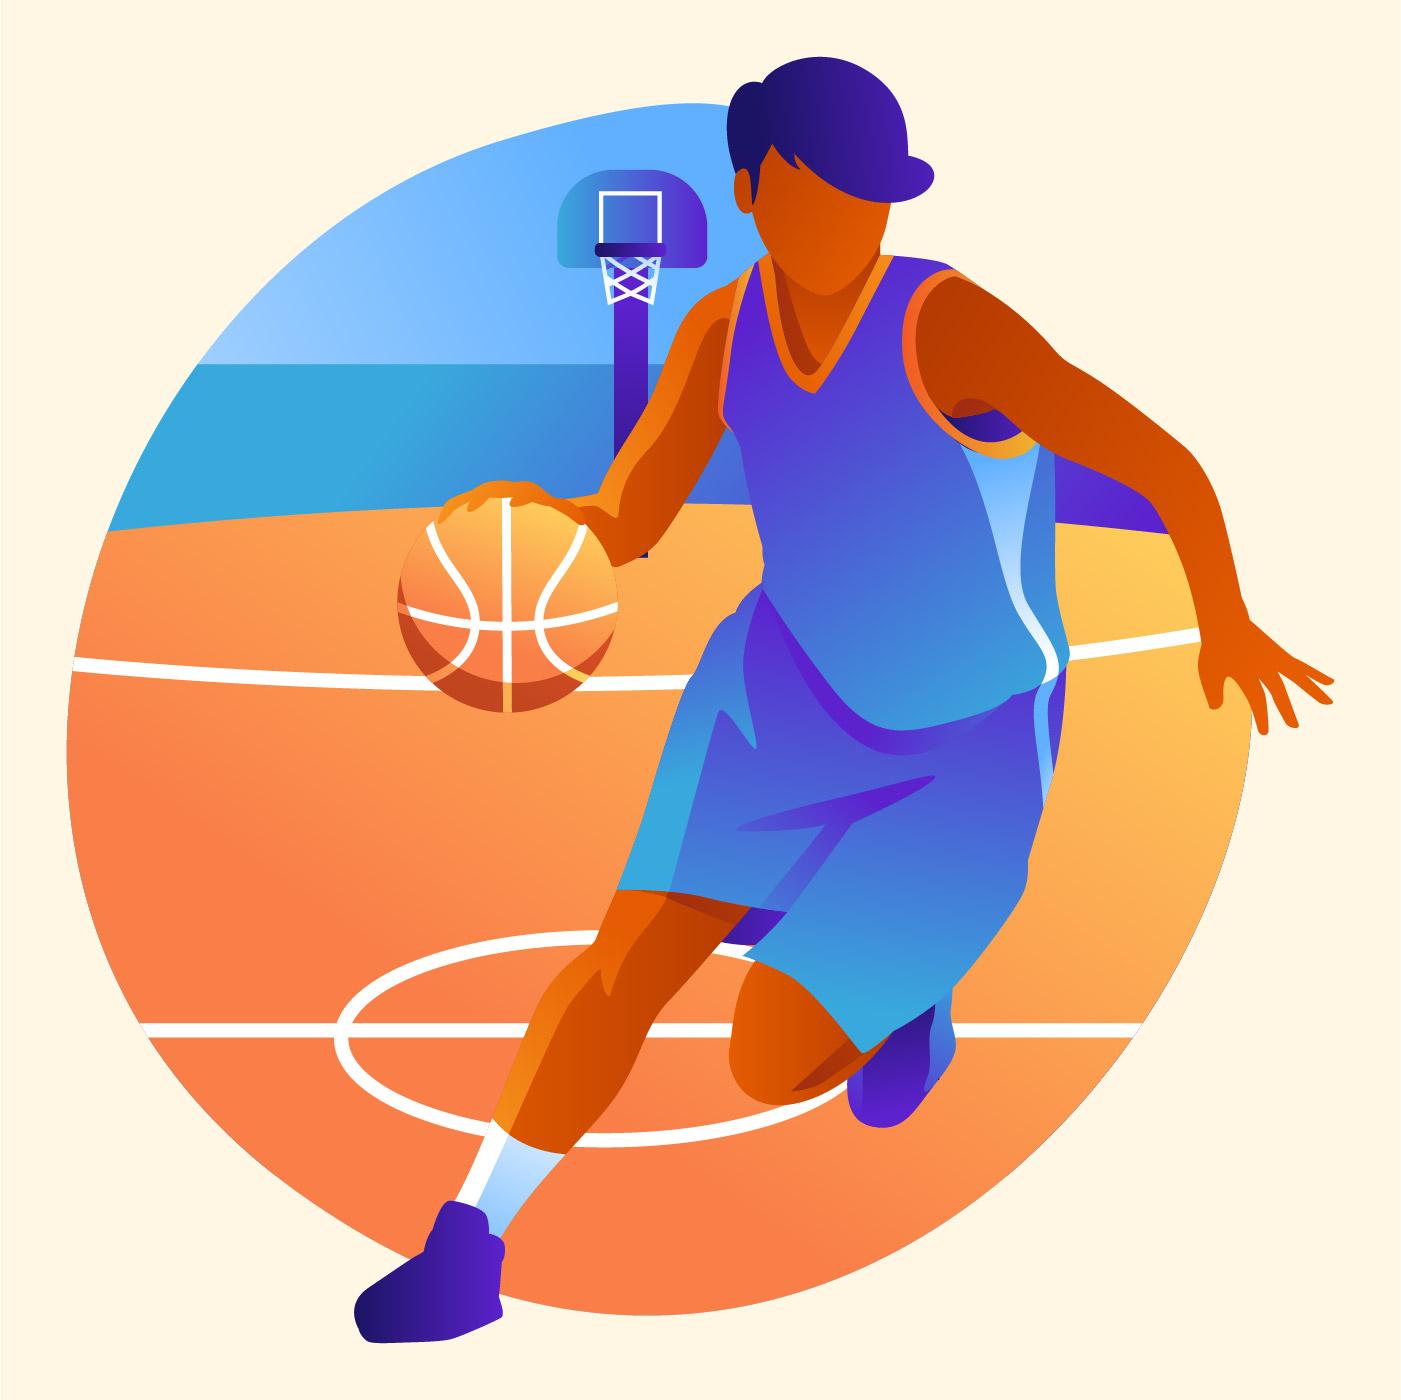 https://static.vecteezy.com/system/resources/previews/000/259/788/original/basketball-vector.jpg